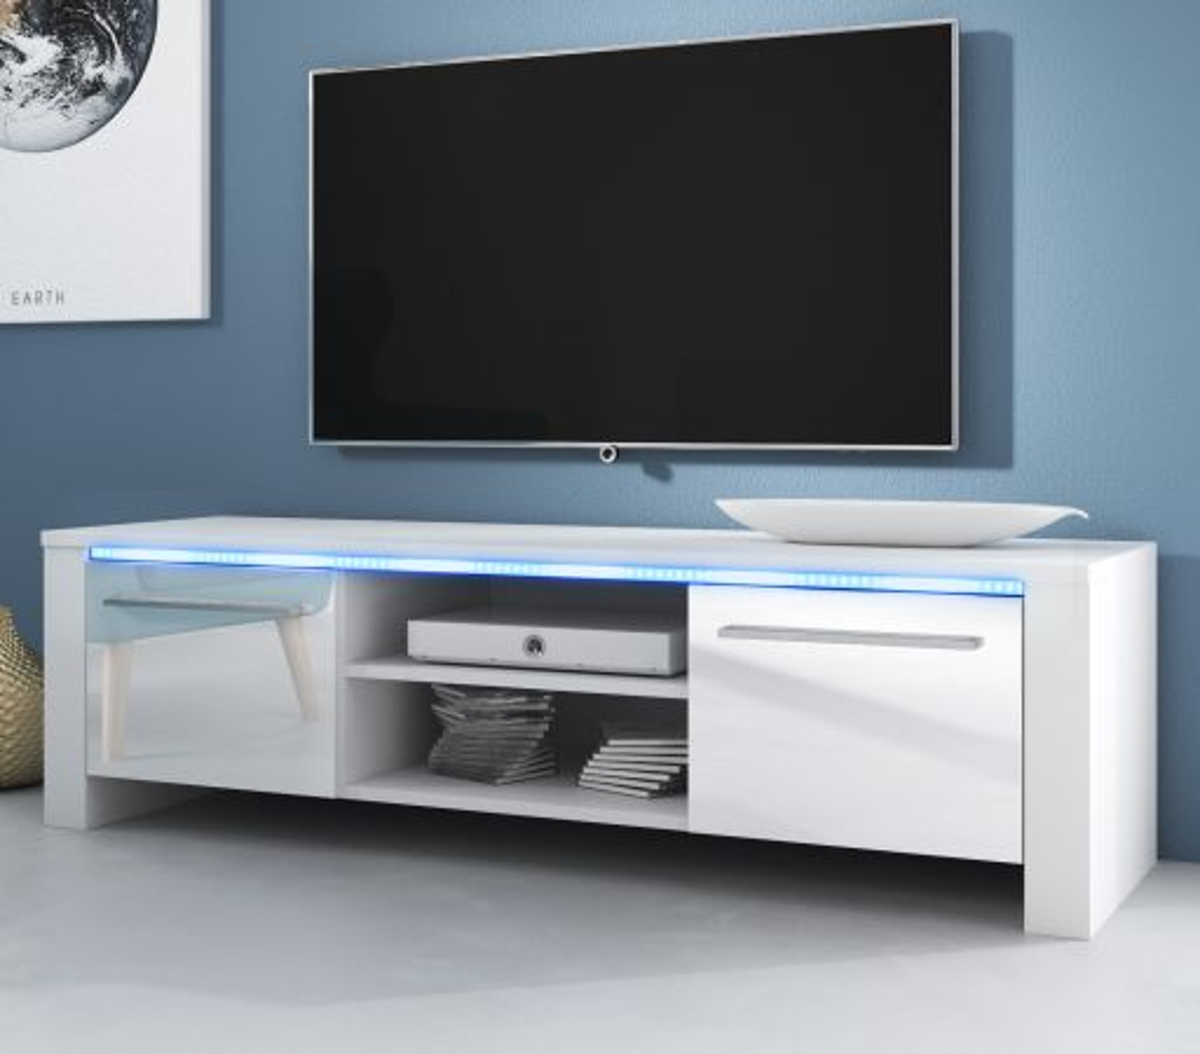 TV-Lowboard Harlem Hochglanz weiss mit Beleuchtung 140 cm